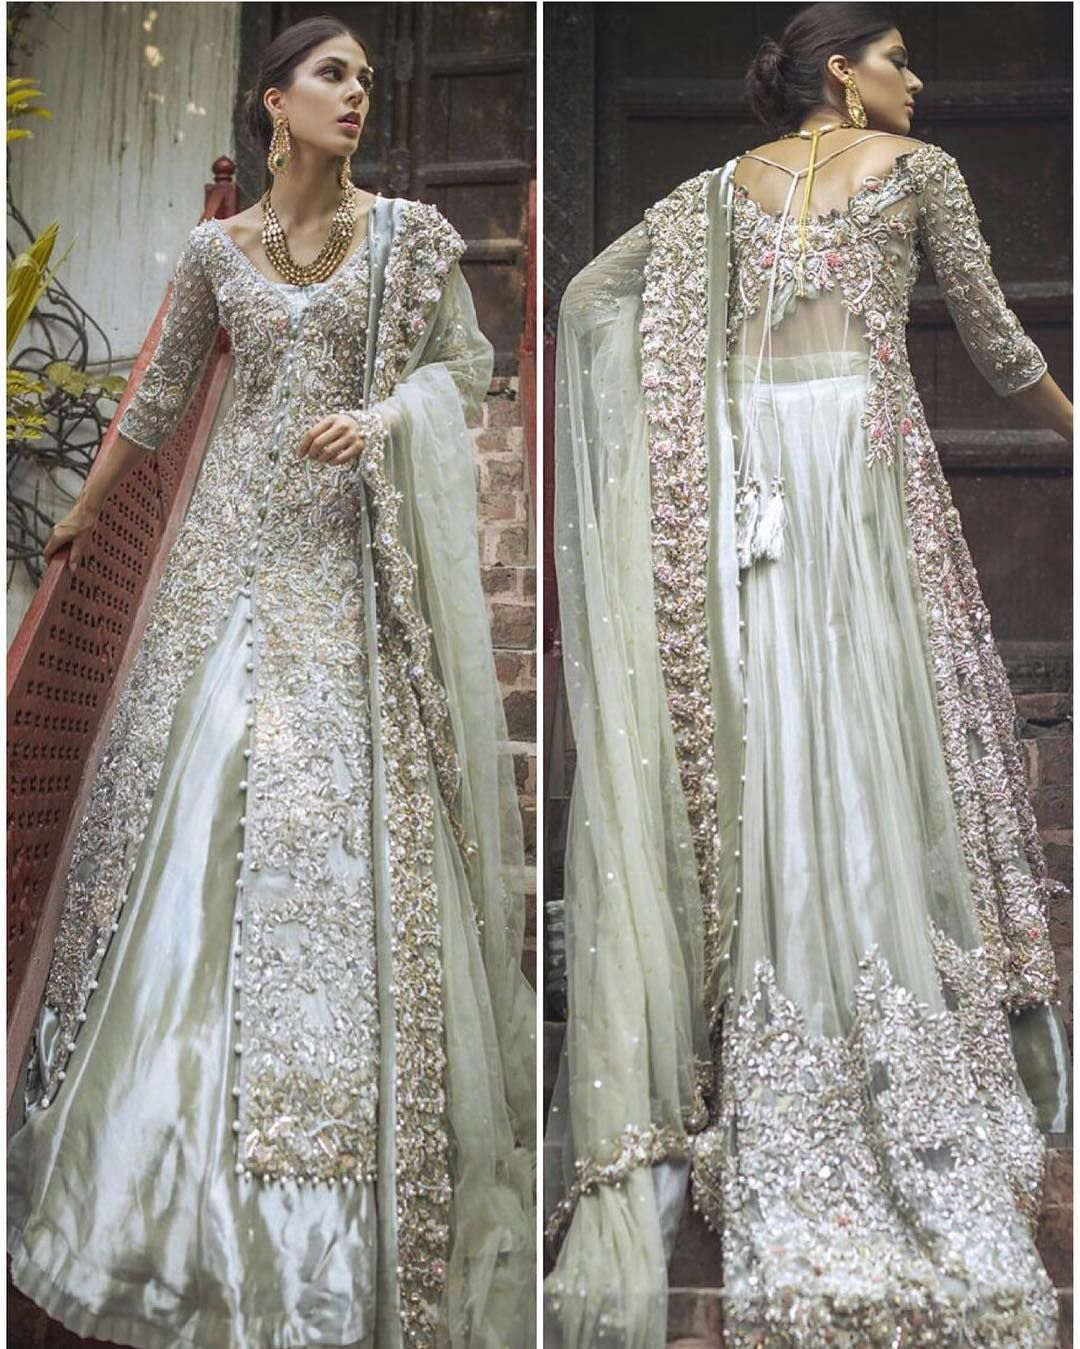 Pakistani bridal Pakistani-bridal Indian outfits Pakistani dresses Pakistani bridal wear Ritu kumar